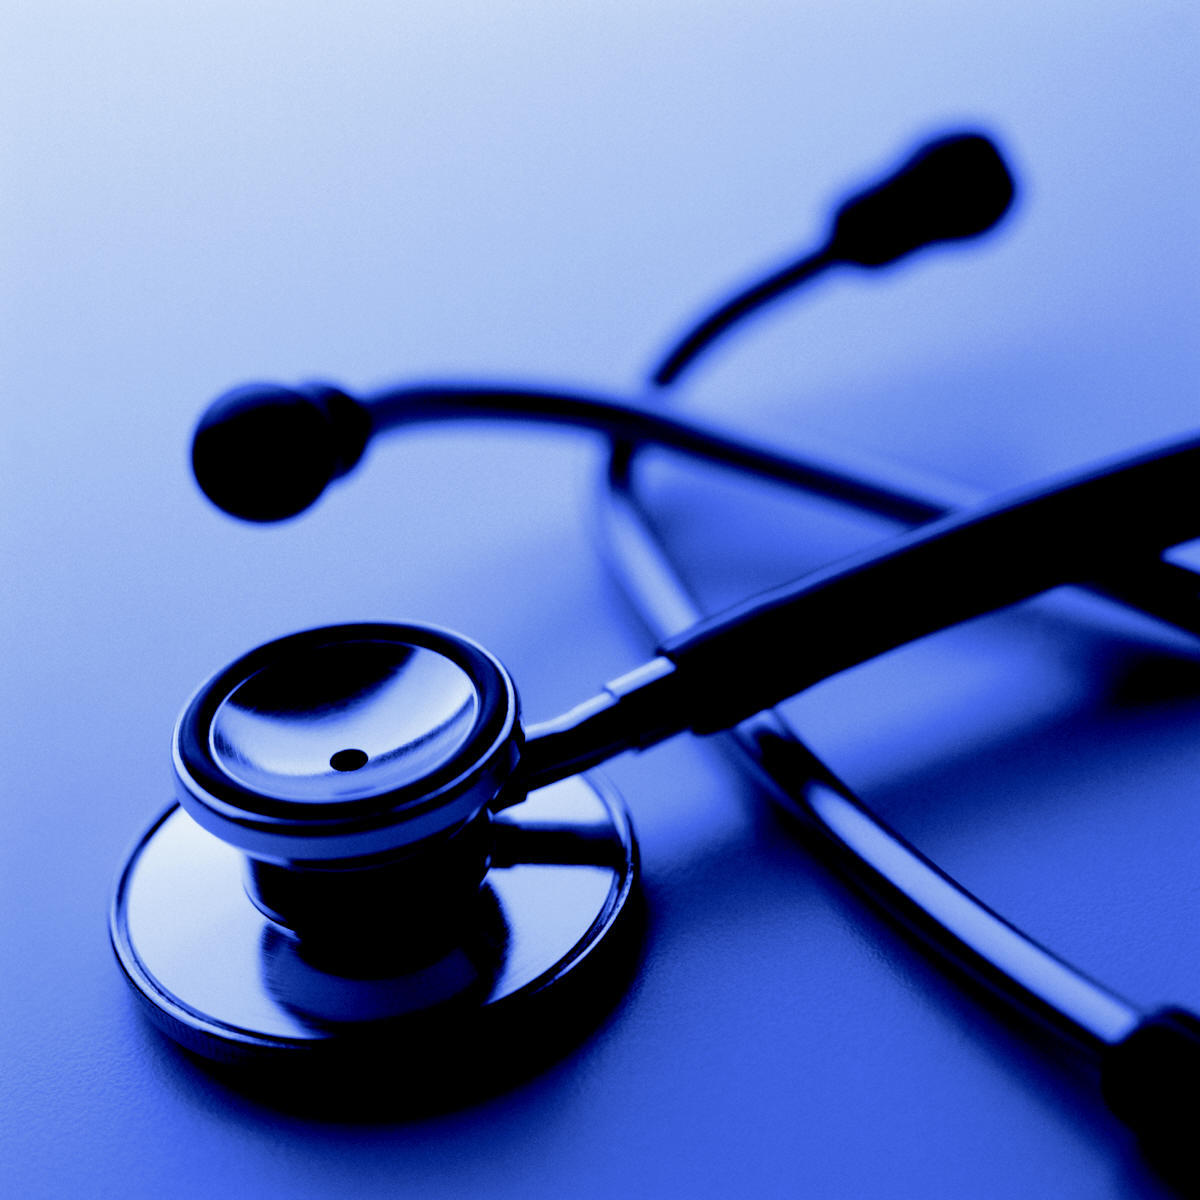 distrofia muscular de Duchenne,distrofia muscular Becker, telemedicina